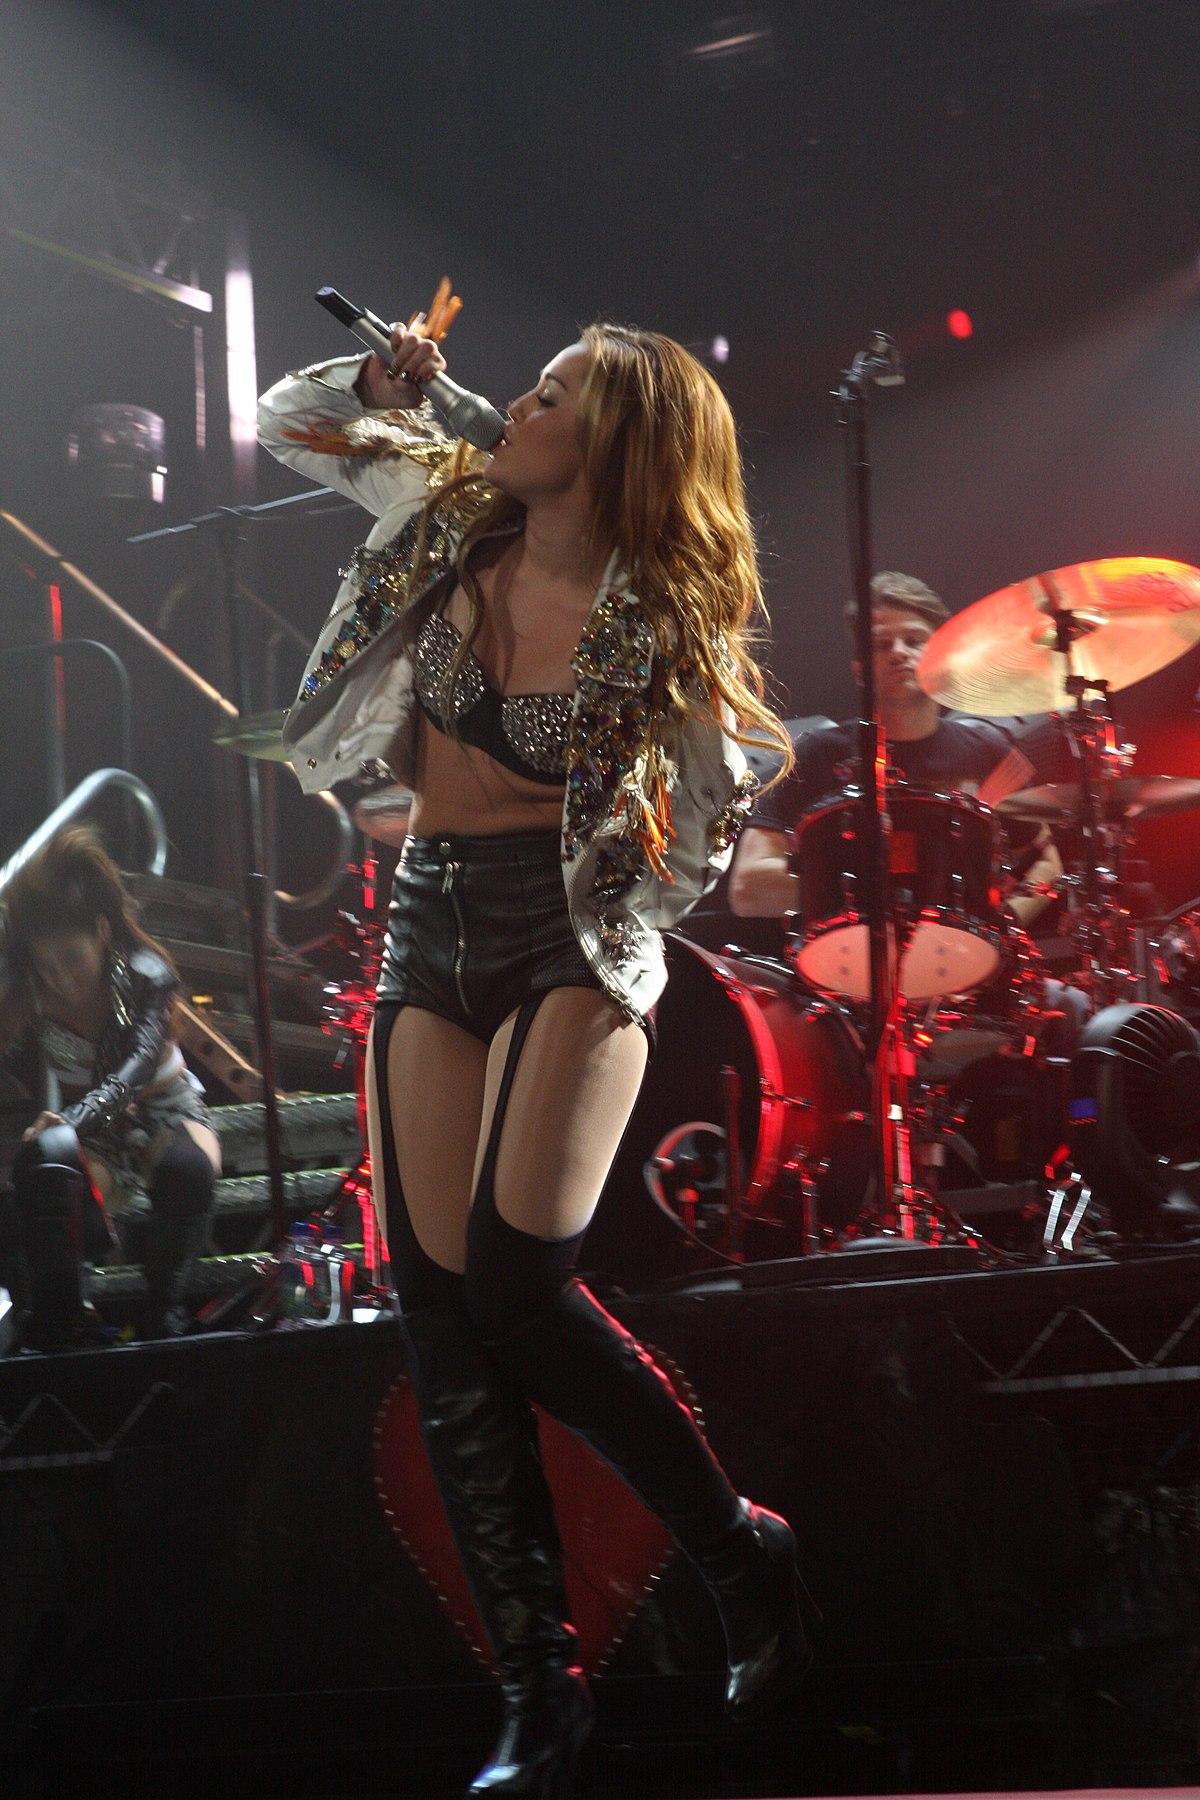 Miley cyrus tour dates in Sydney